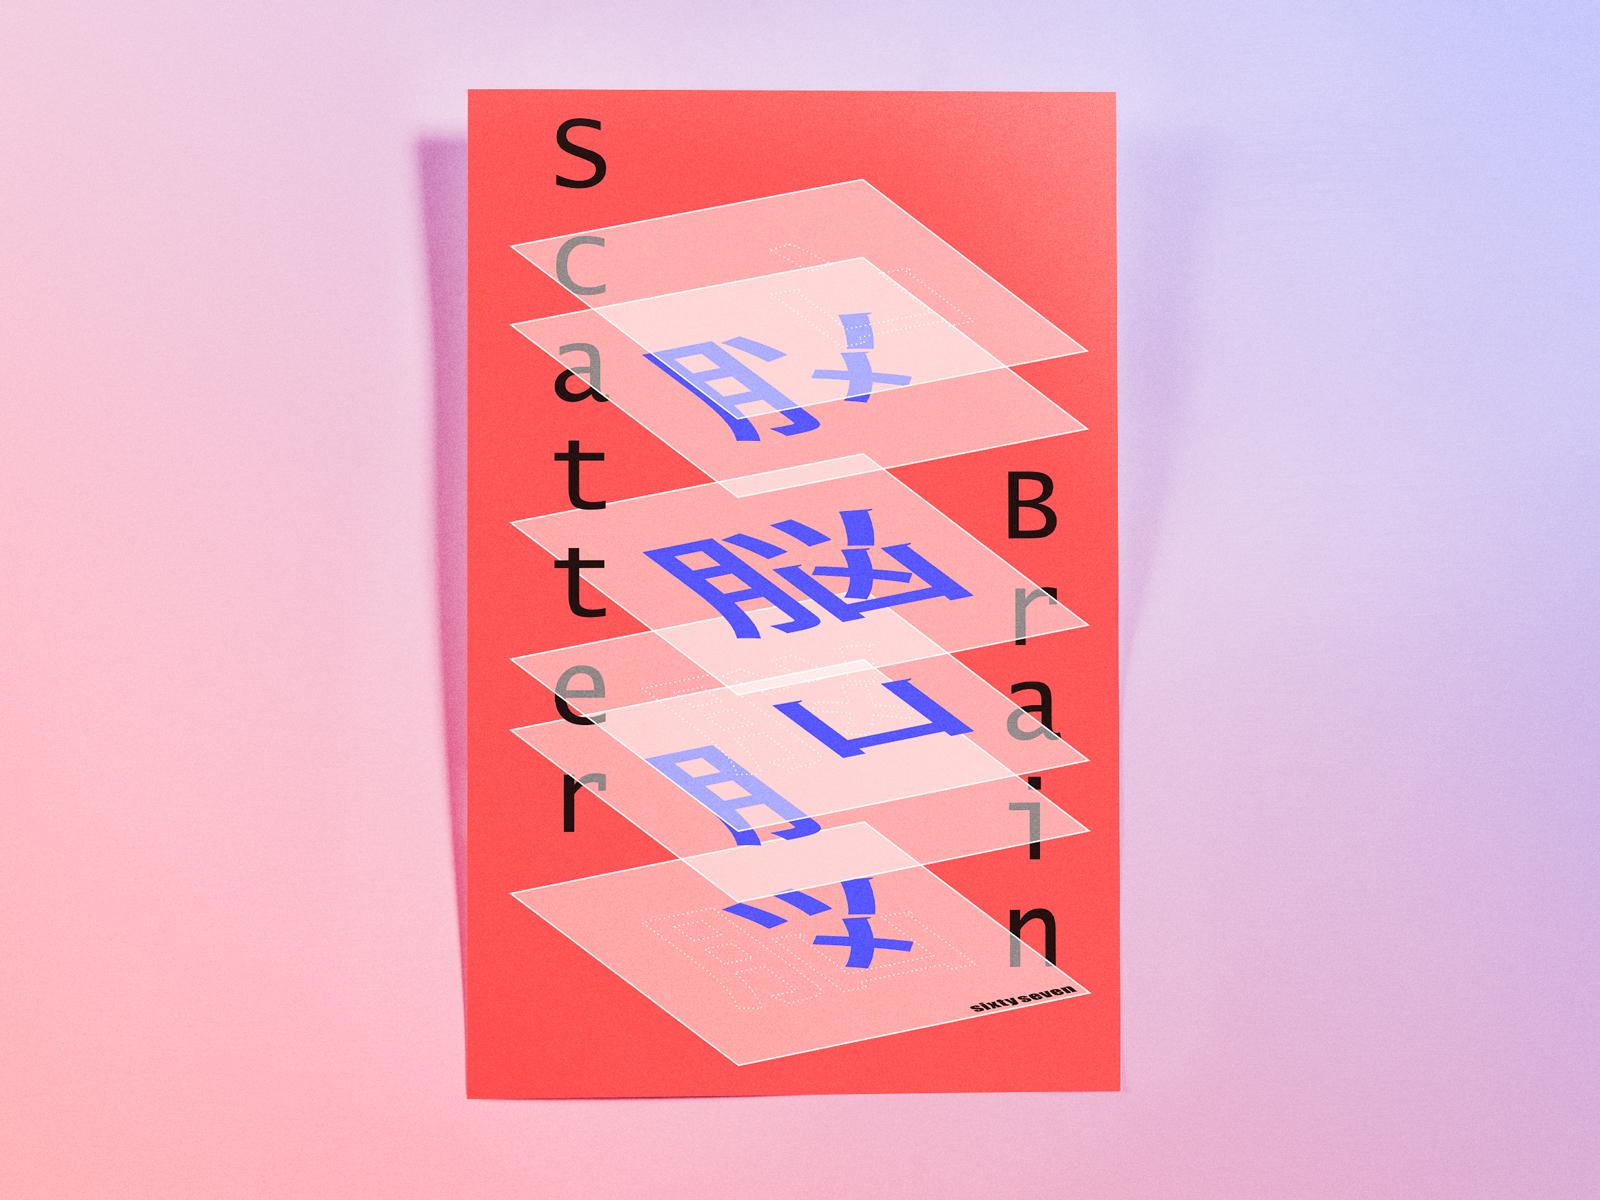 poster-4-1-19_sixtyseven-web-mockup.jpg